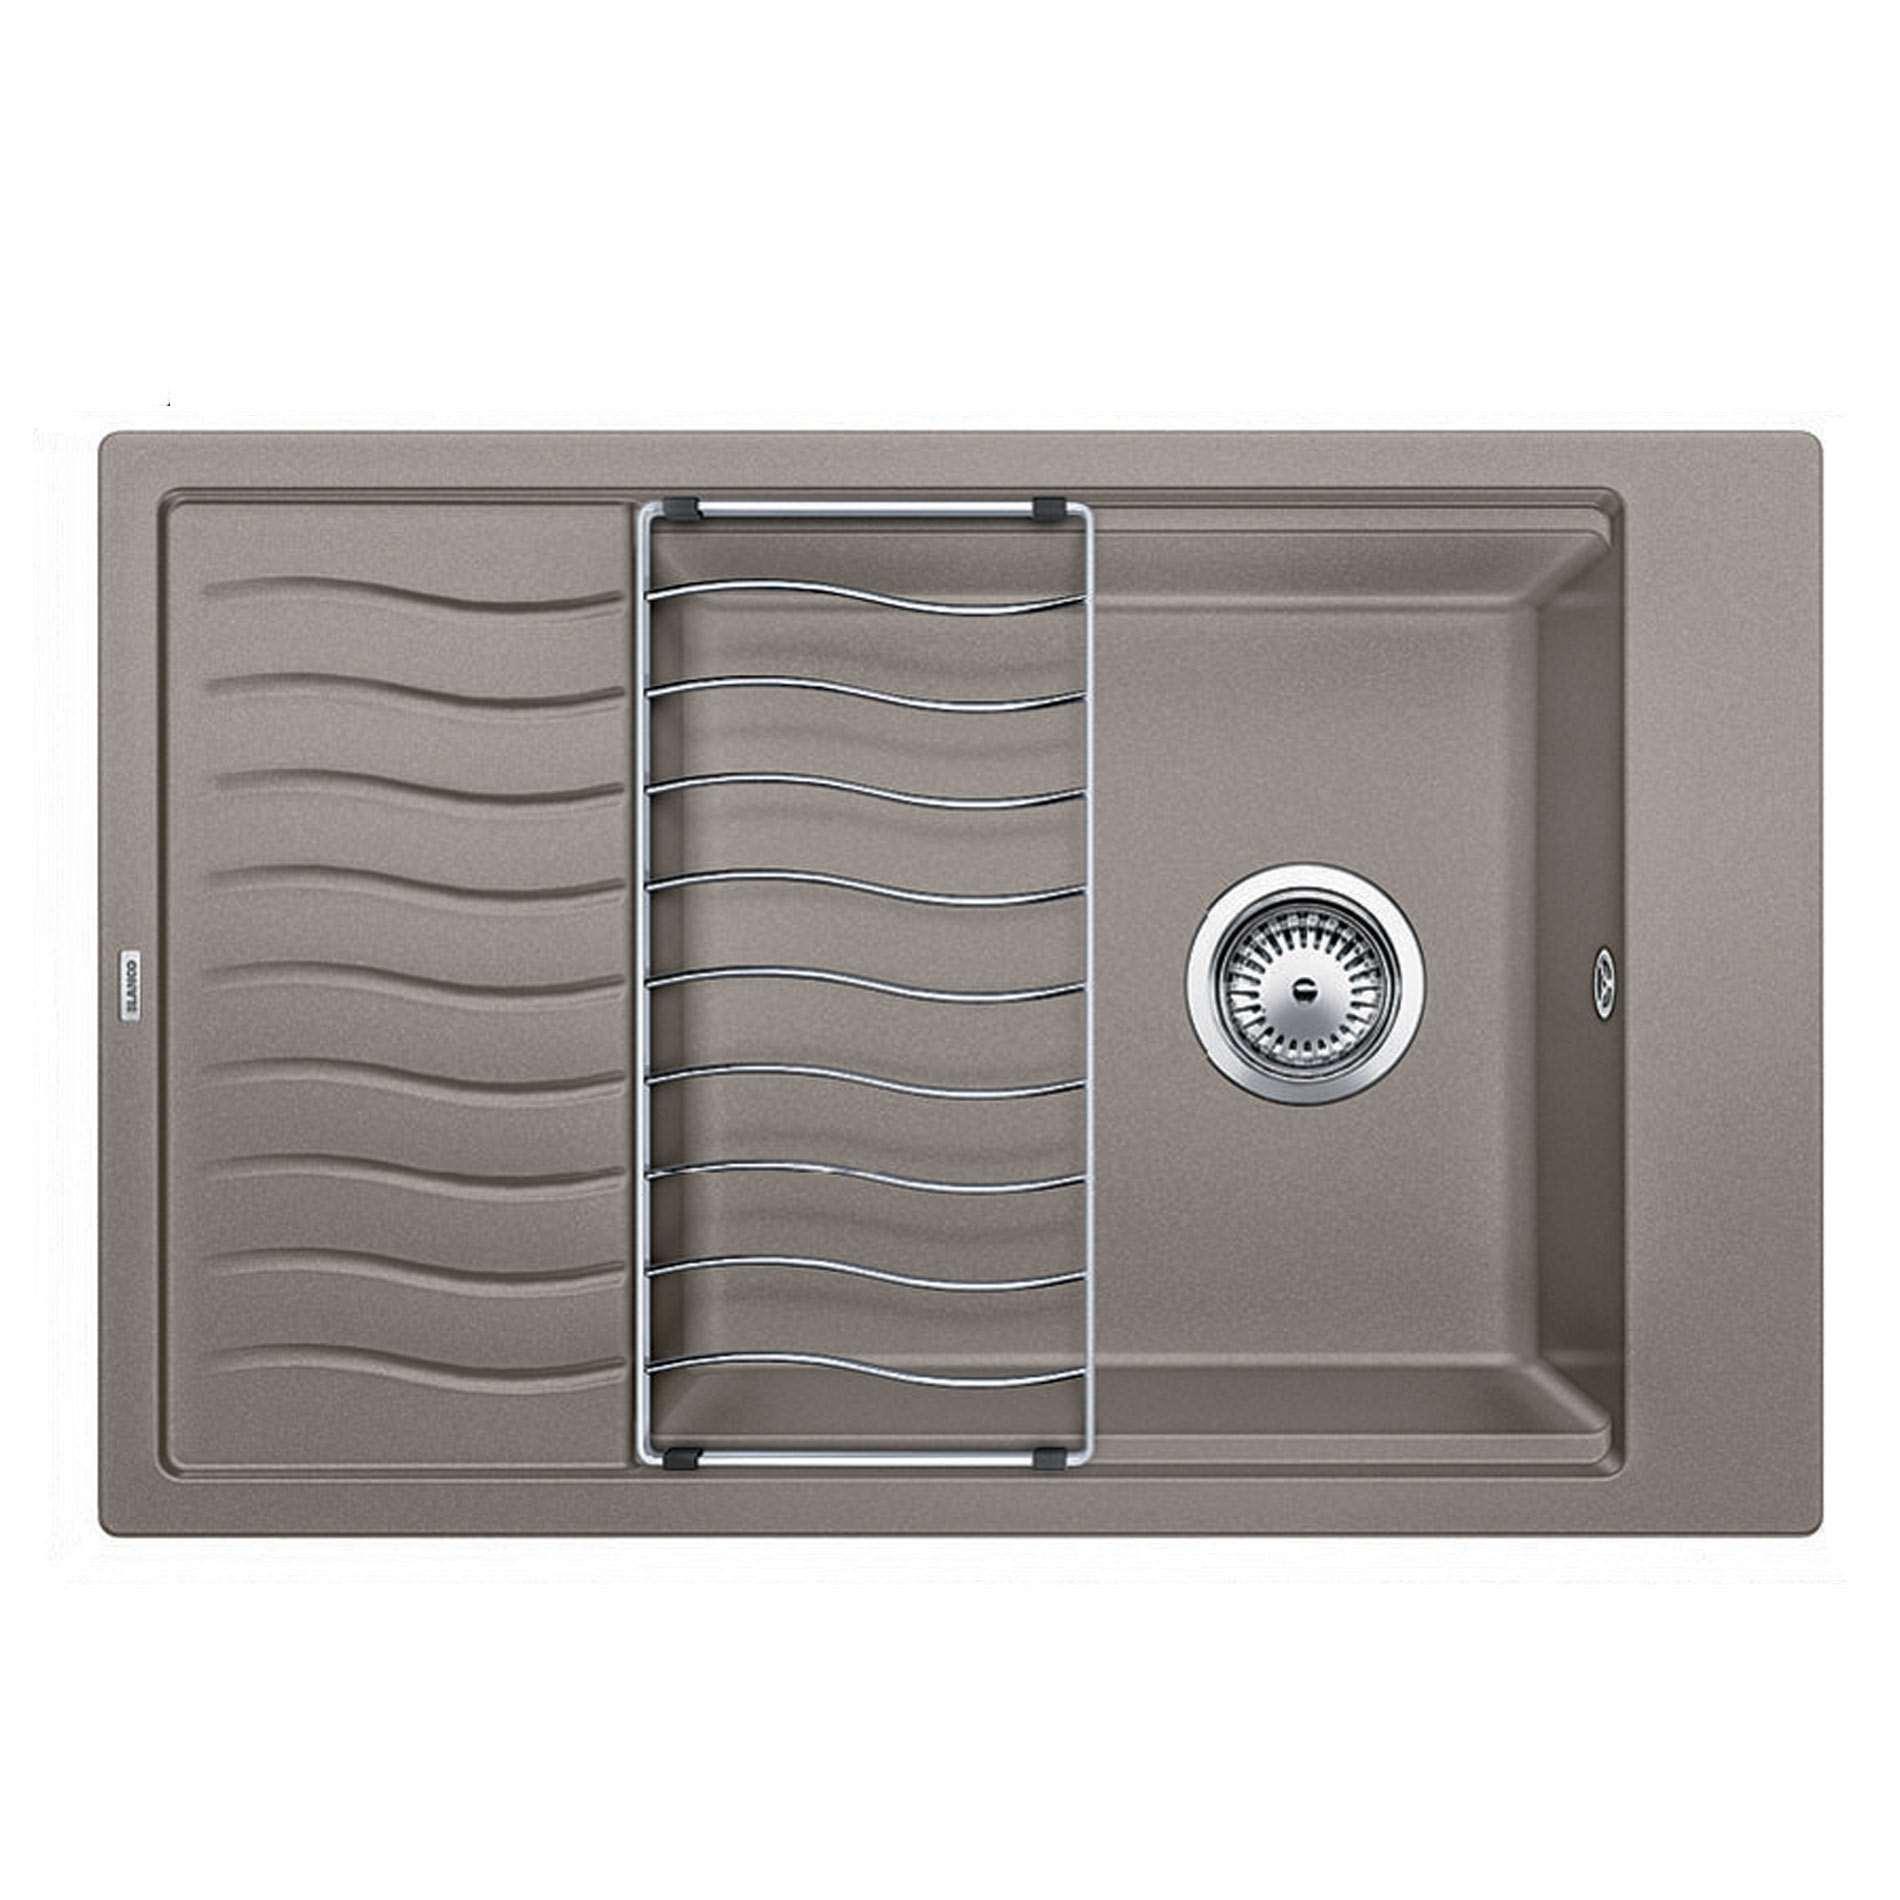 blanco elon xl 6 s tartufo silgranit sink kitchen sinks. Black Bedroom Furniture Sets. Home Design Ideas